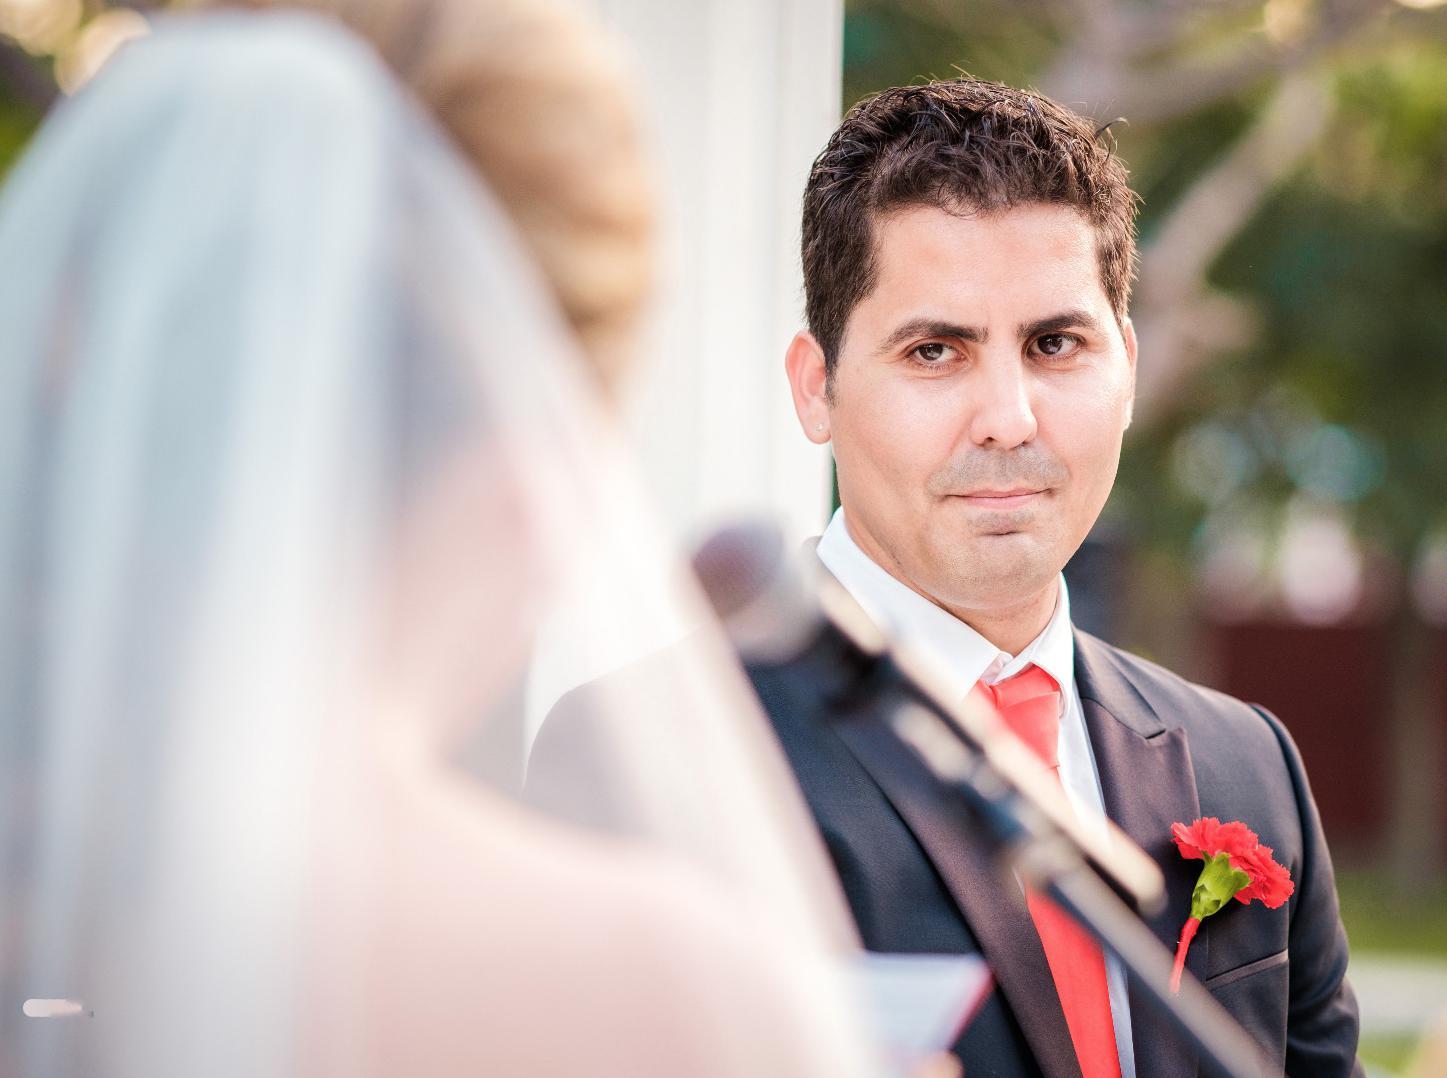 bodas-sin-clasificar-sin-tema-cuba-28232.jpg